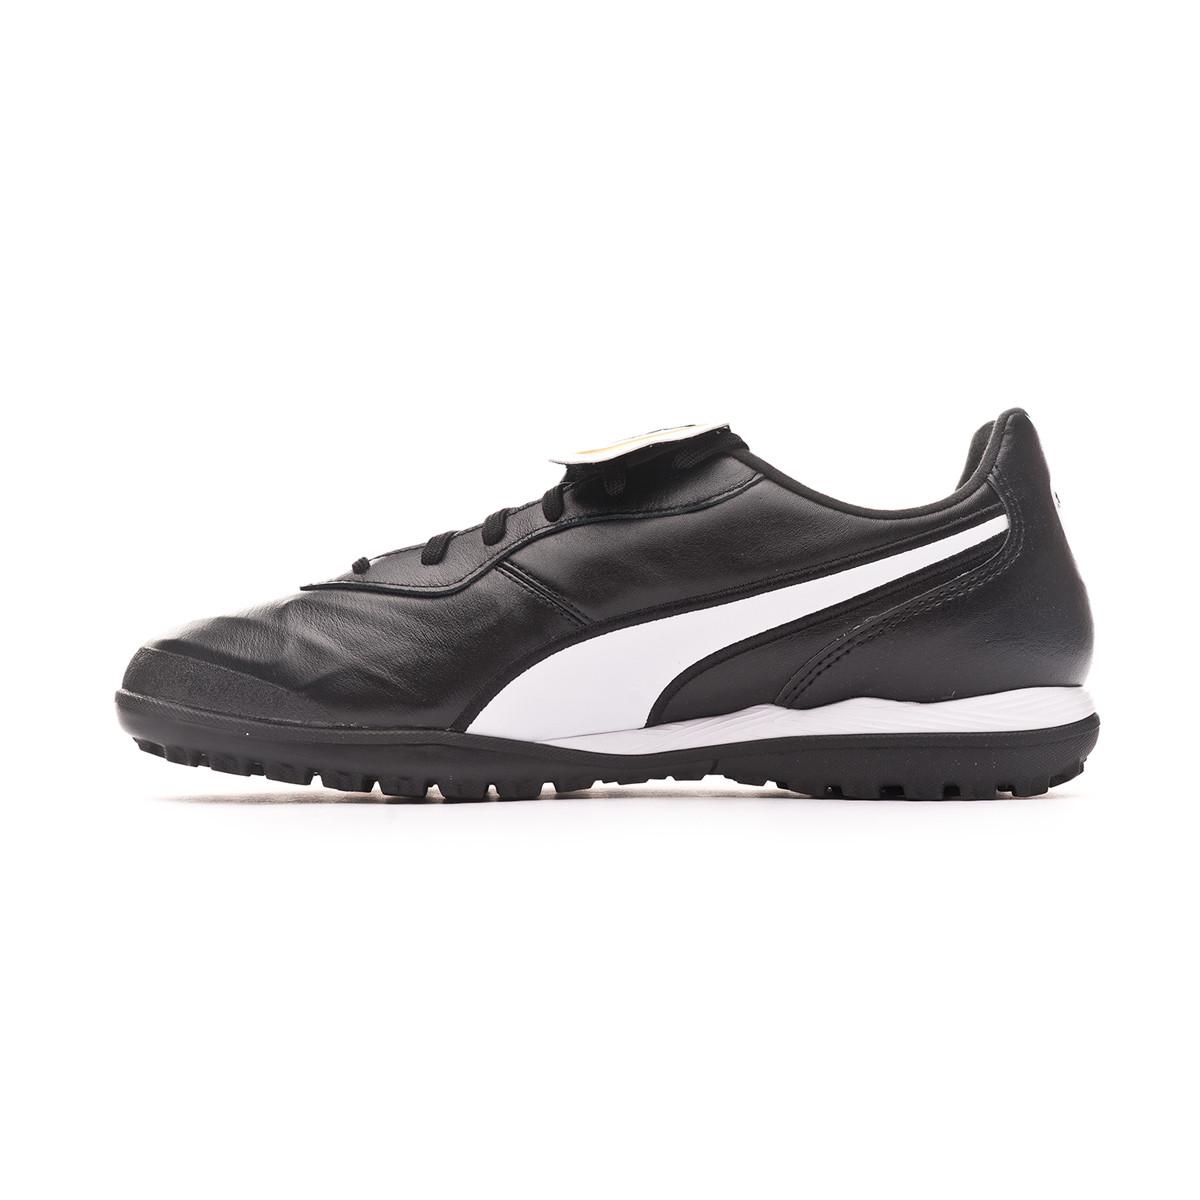 puma king astro turf football boots